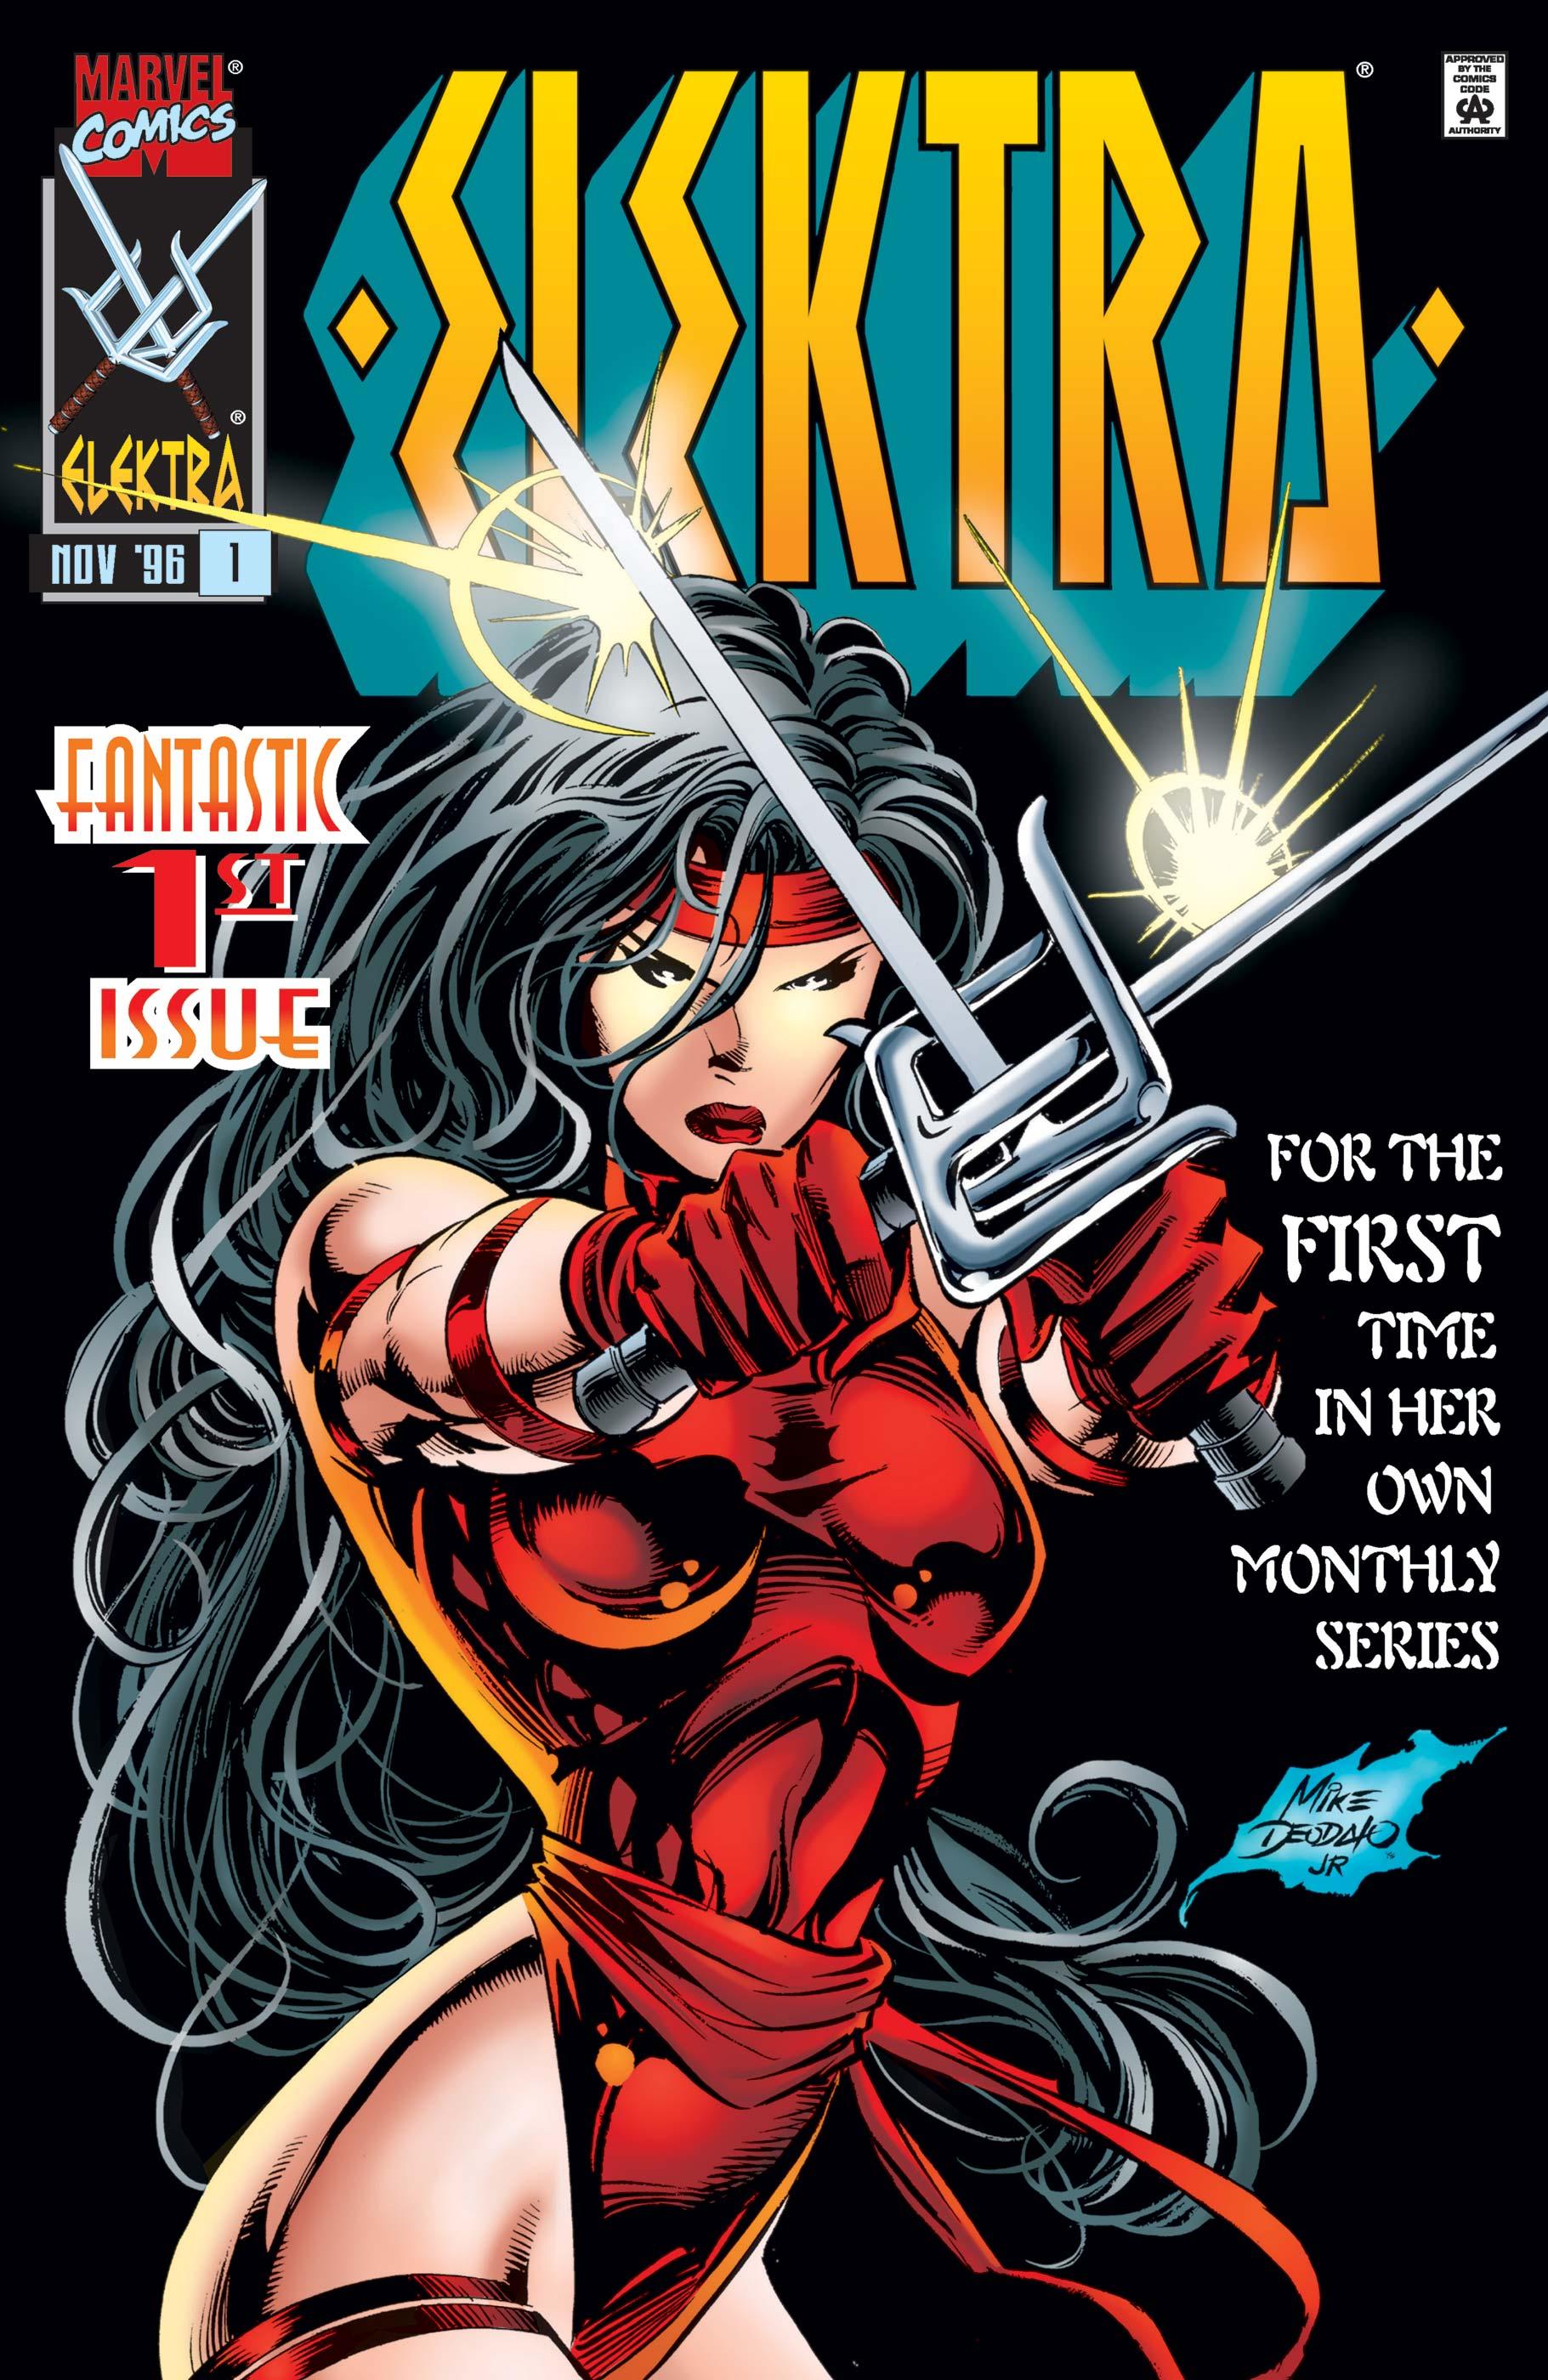 Elektra (1996) #1